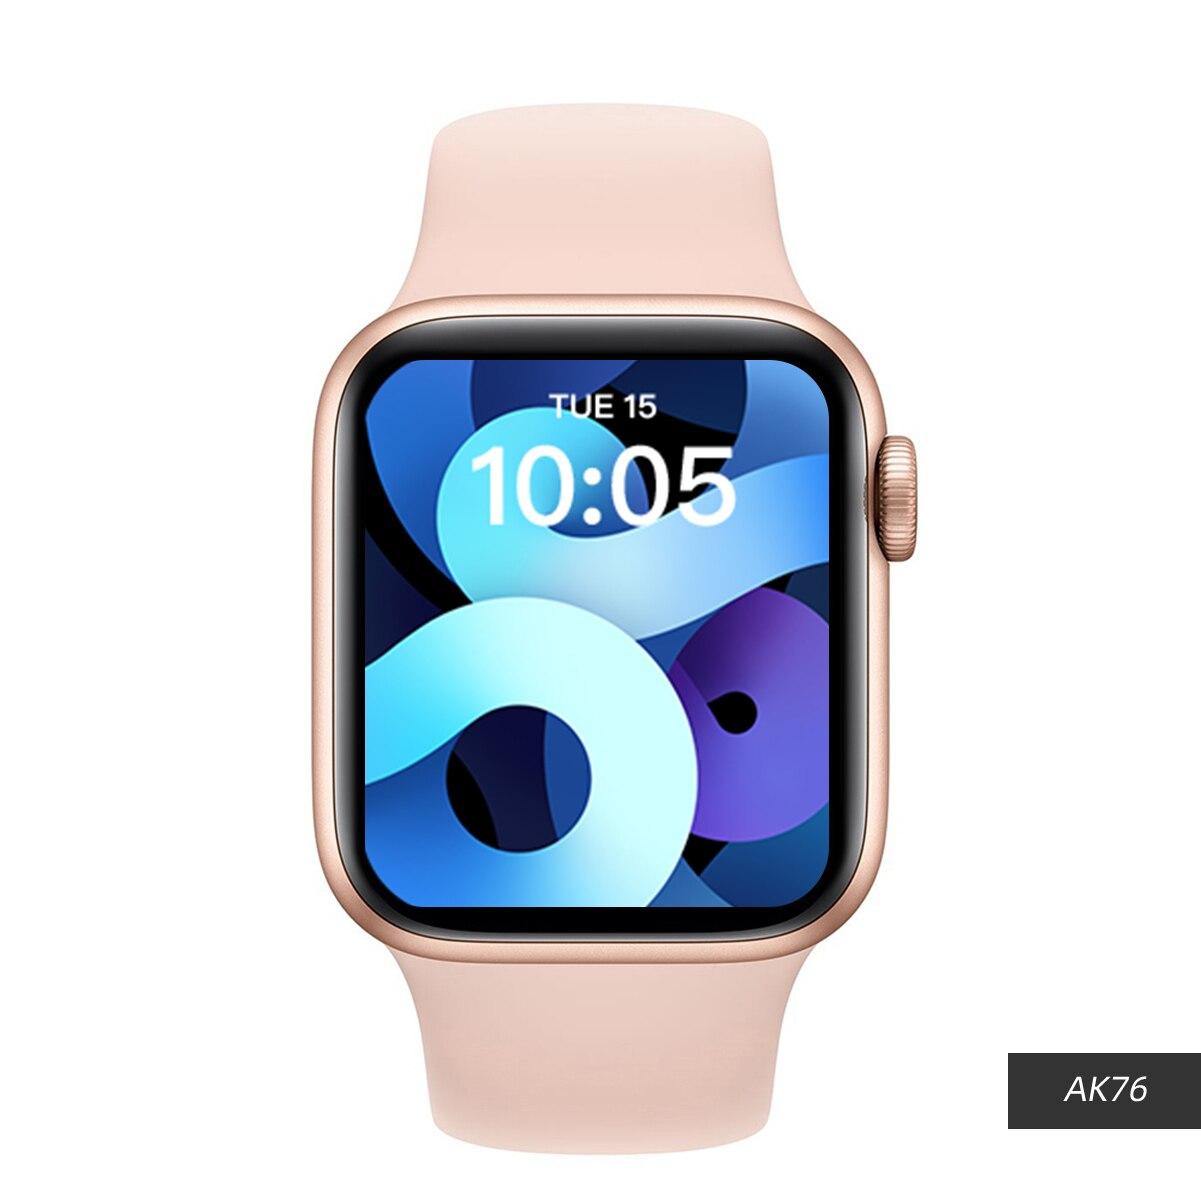 Review 5pcs 2021 IWO AK76 Smart Watch Women Men Games watch 44MM Smartwatch Bluetooth Call Heart Rate 1.75 Inch For Android IOS PK X16